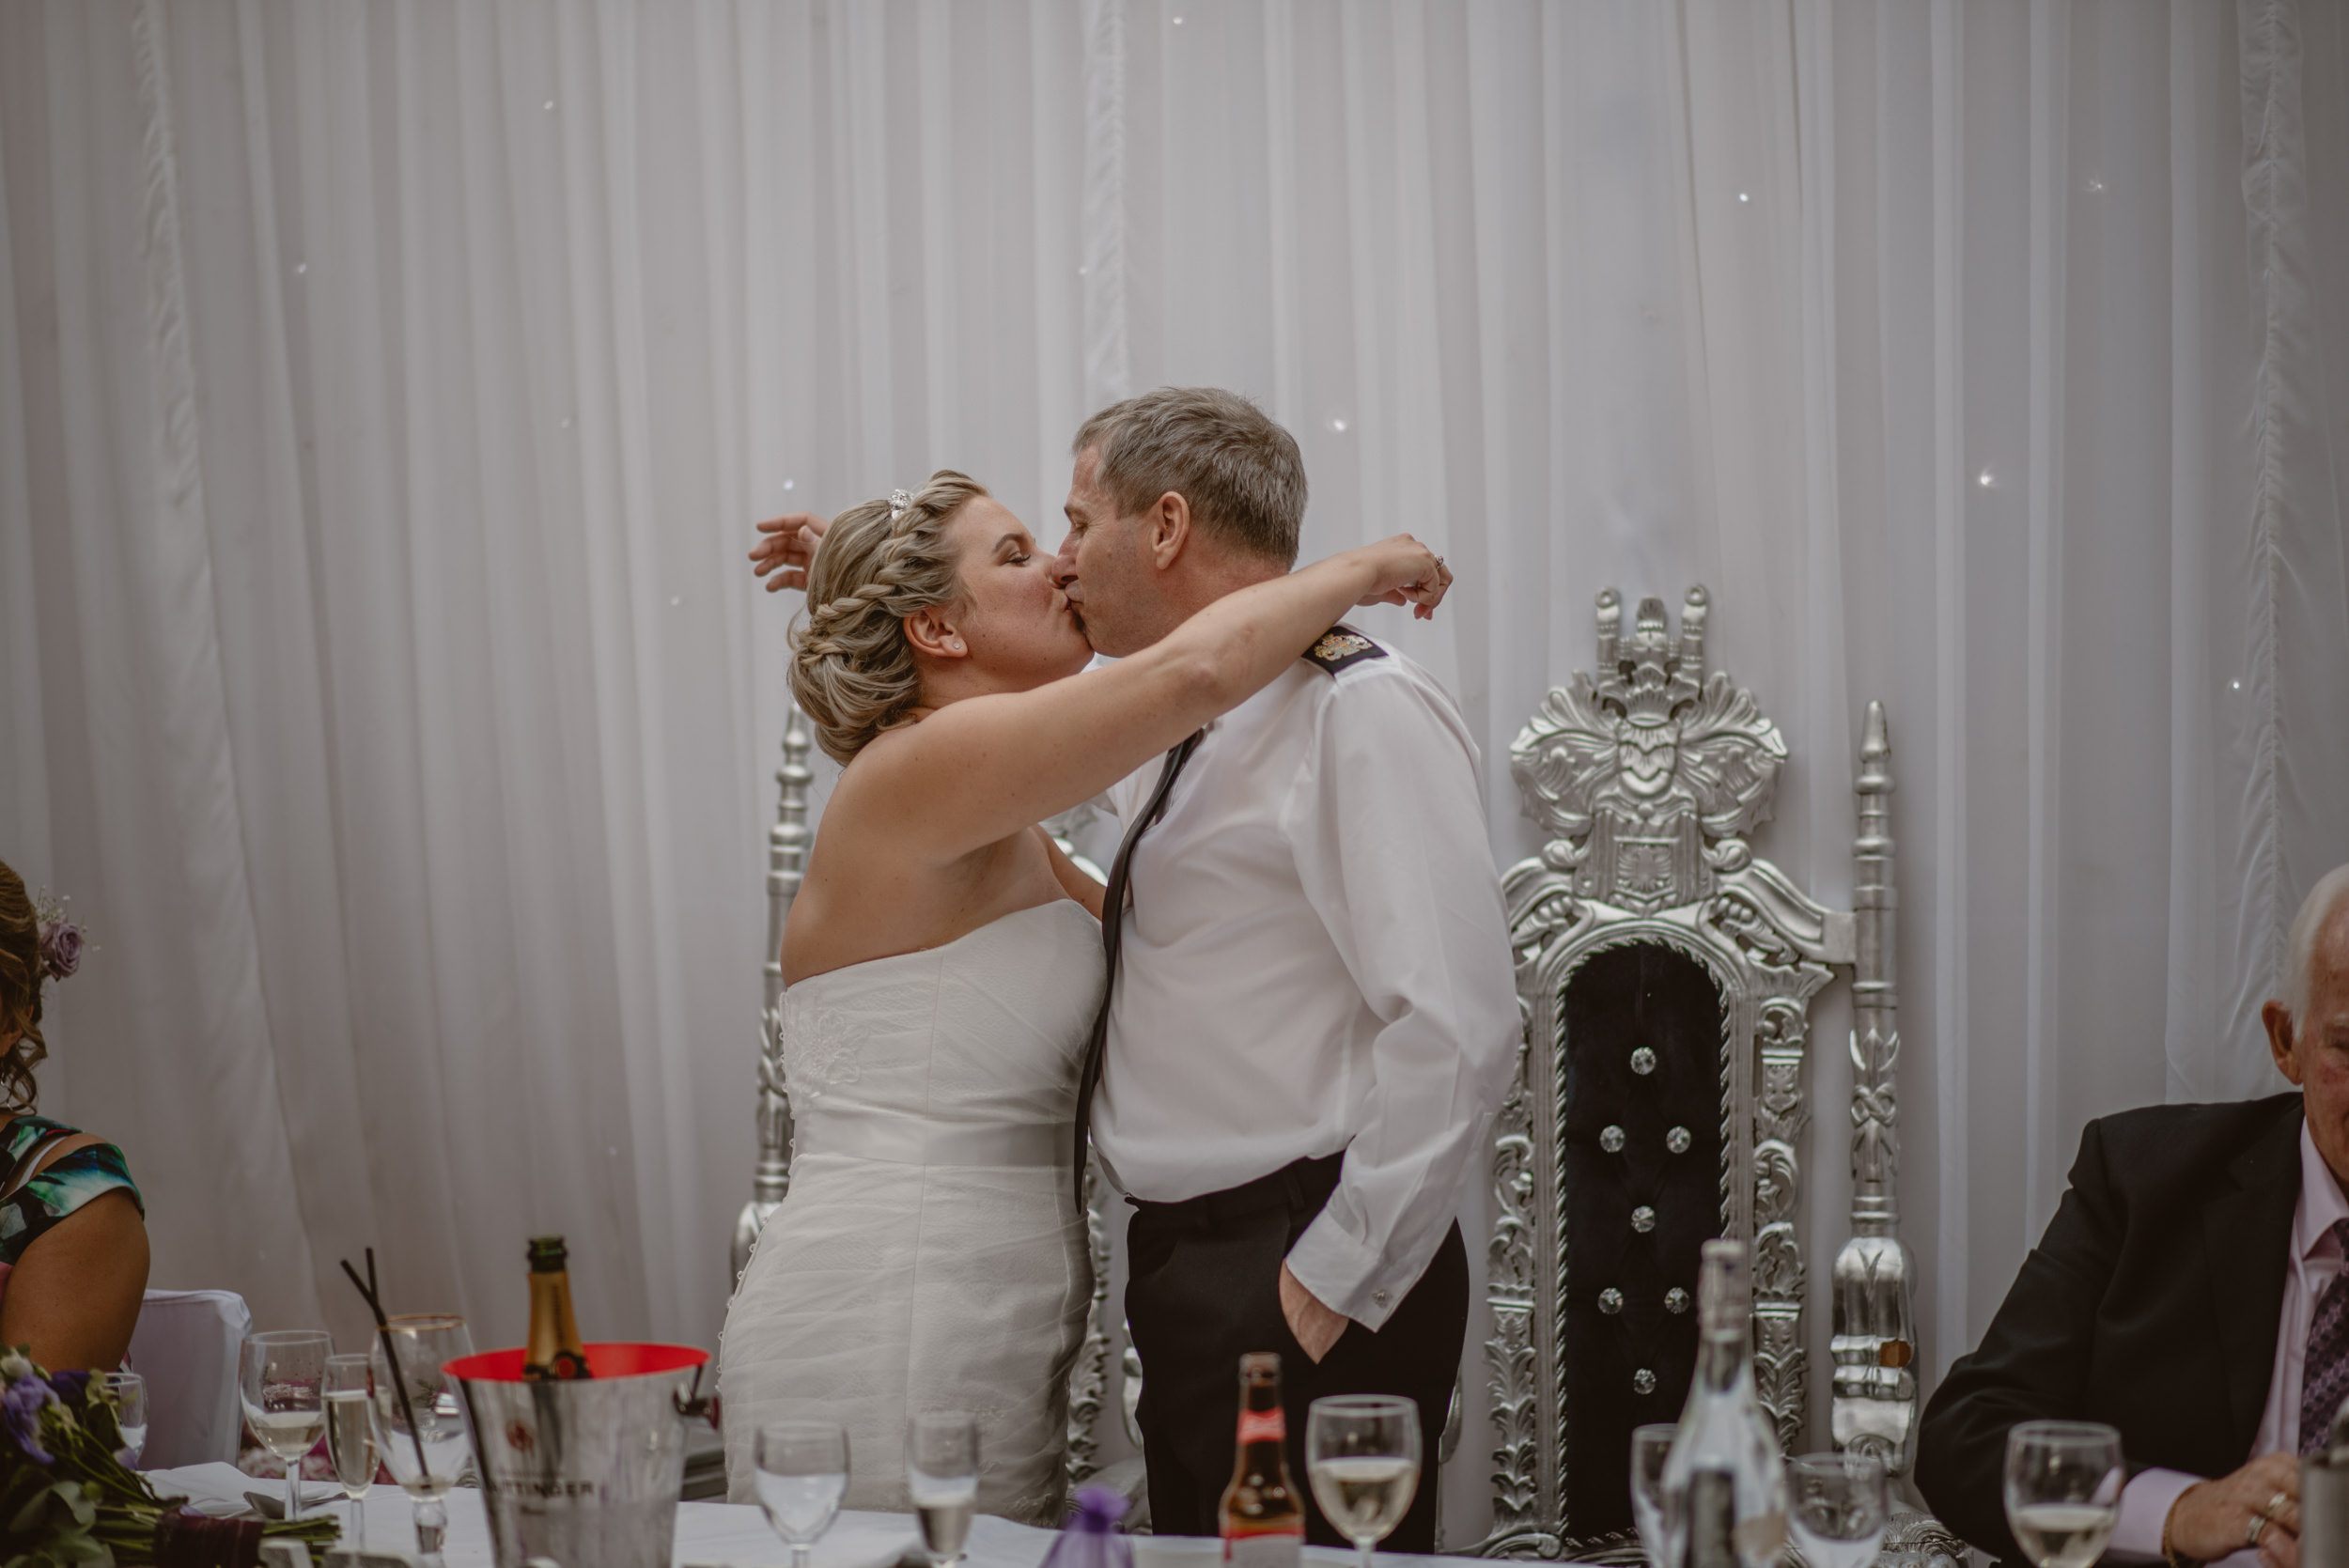 Chantelle-and-Stephen-Old-Thorns-Hotel-Wedding-Liphook-Manu-Mendoza-Wedding-Photography-430.jpg